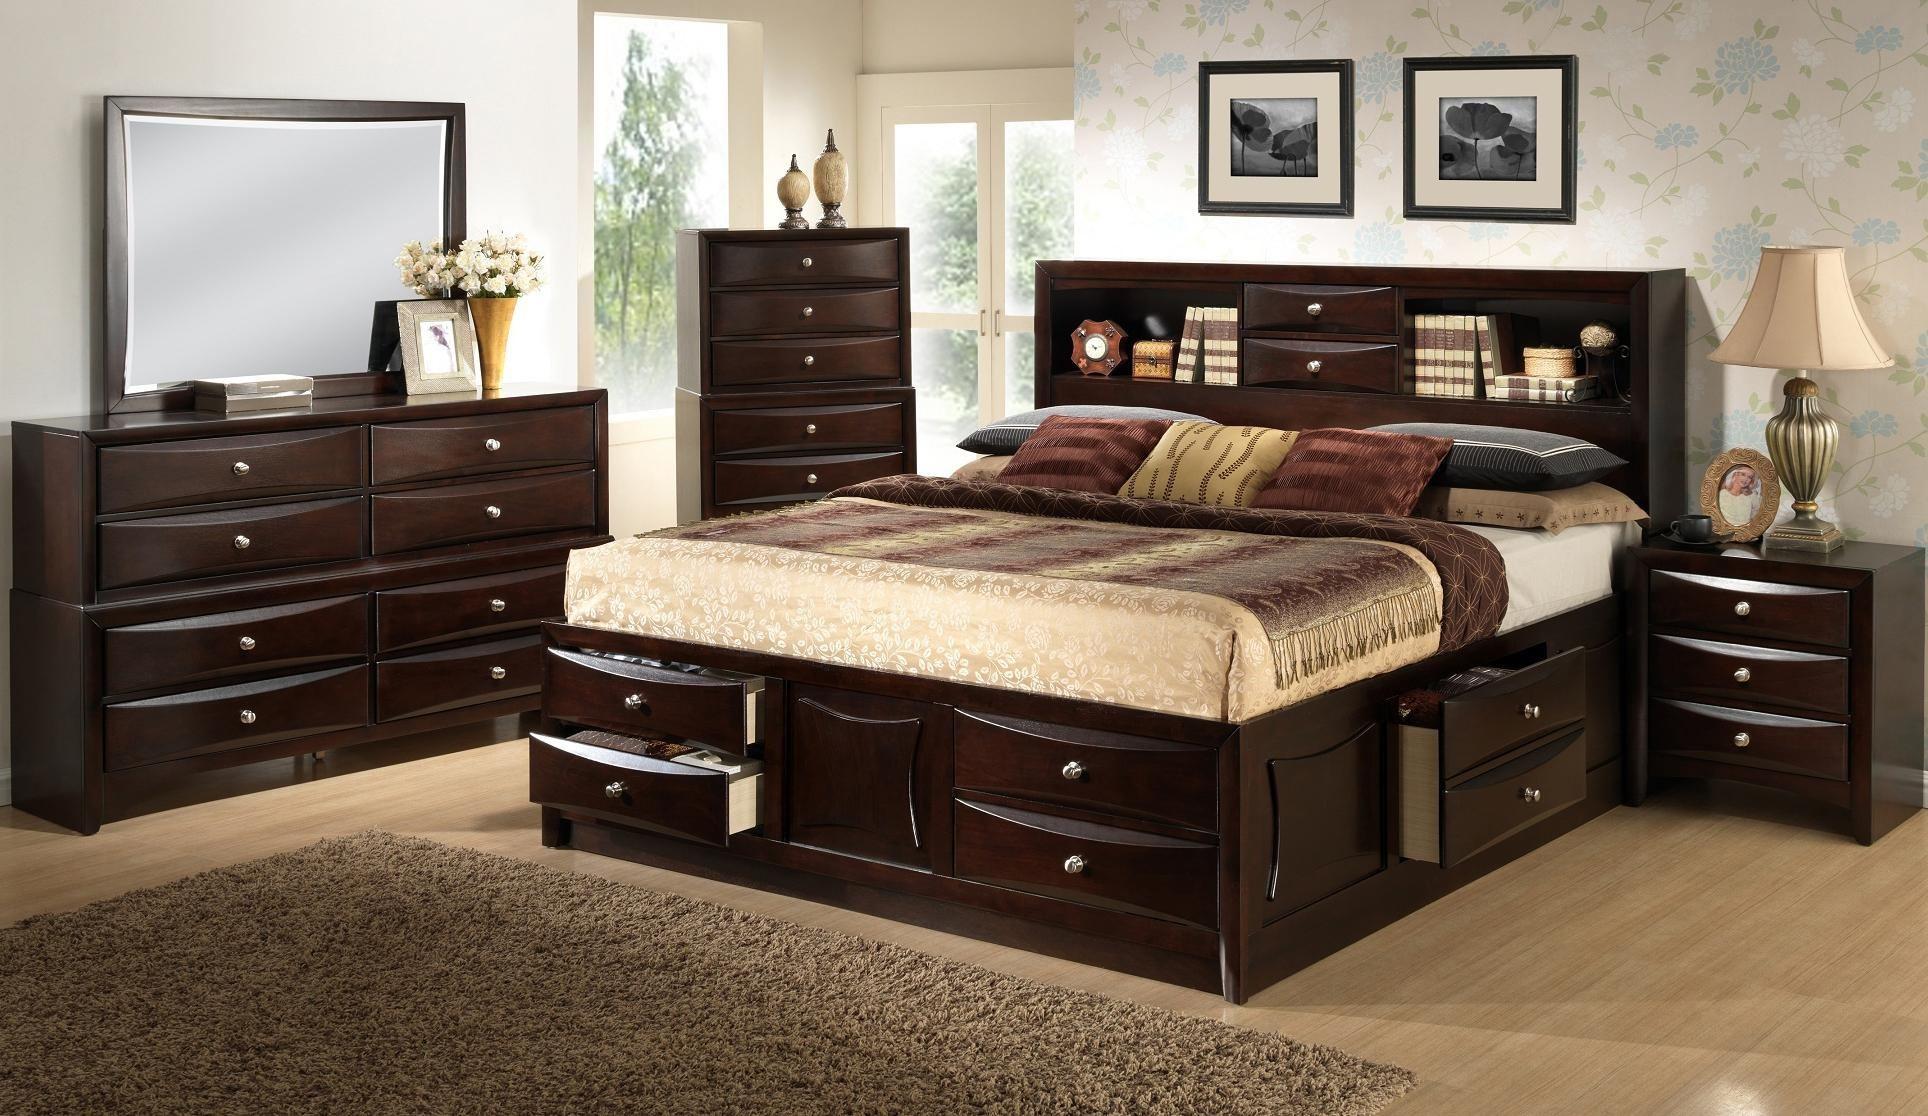 King Bedroom Sets Espresso Home Decor Inspirations Dark Wood Furniture